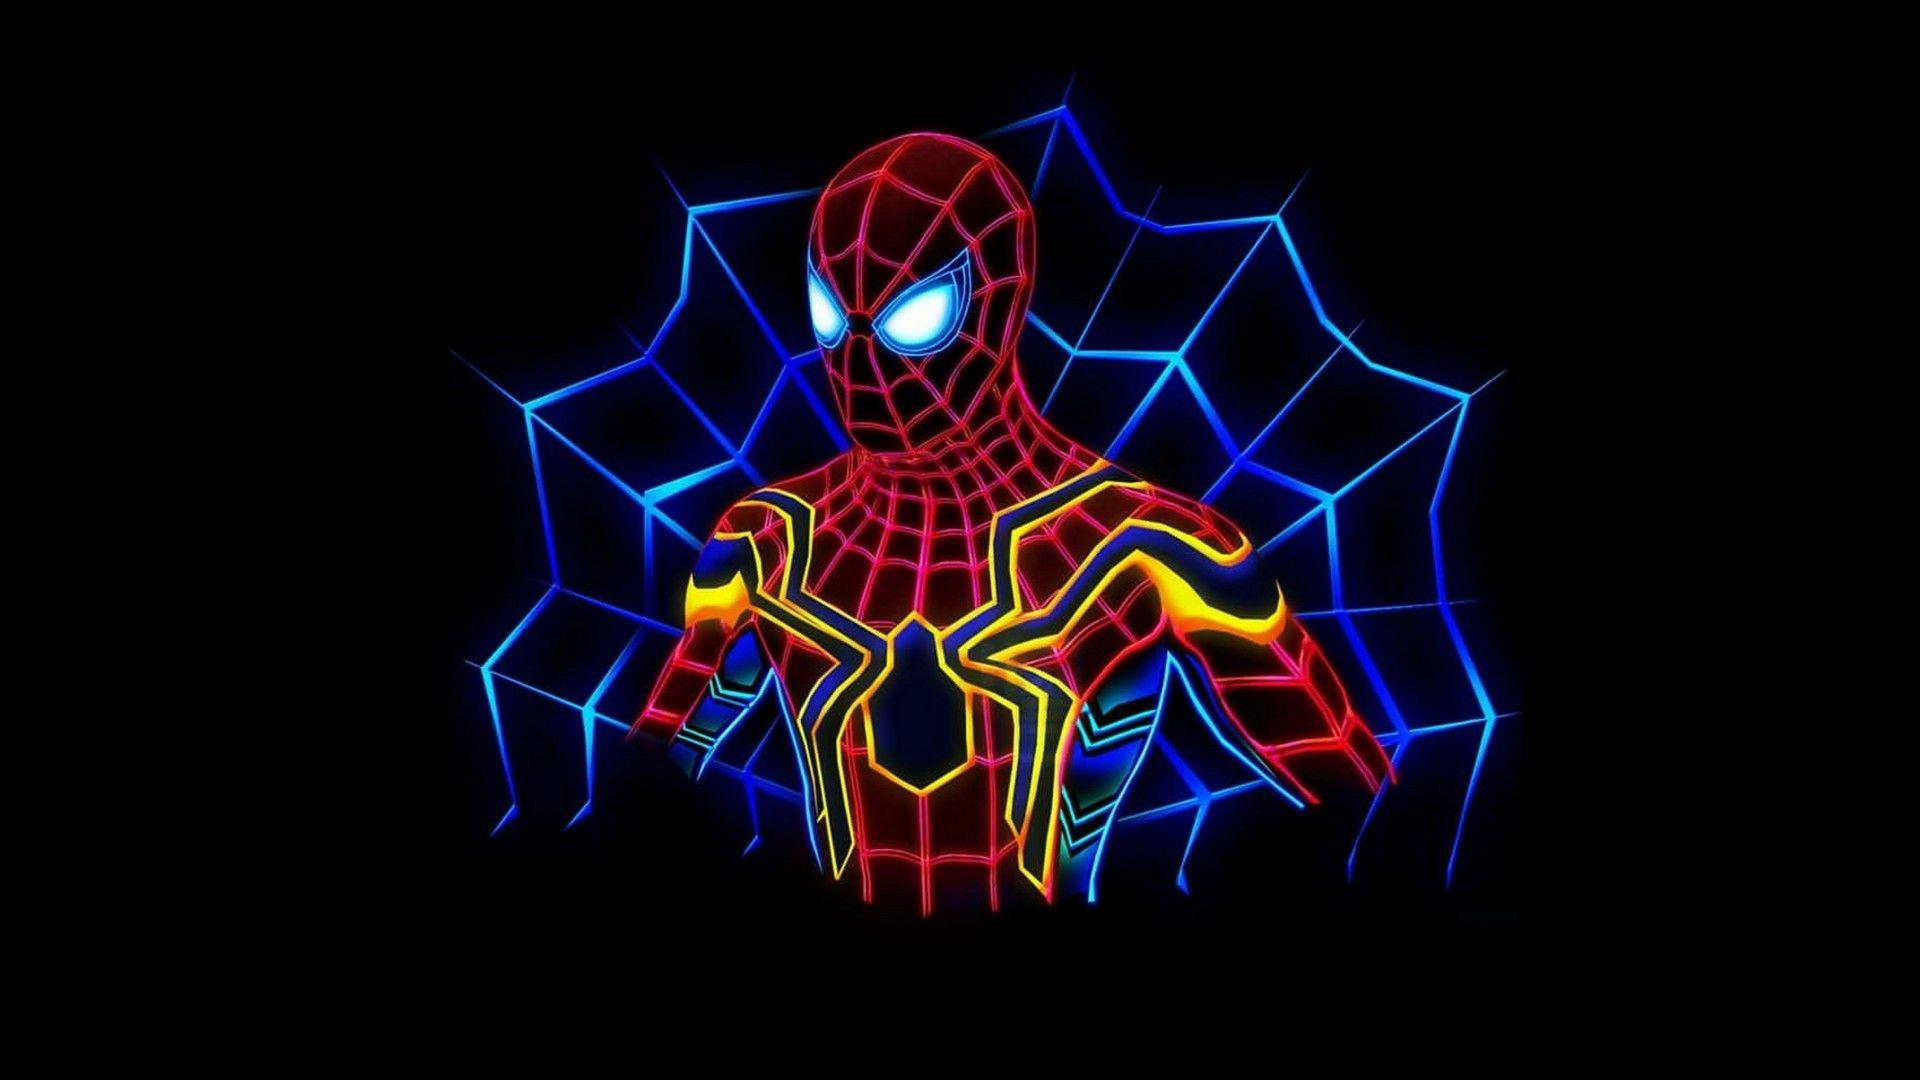 Spider Man 2019 Far From Home Wallpaper Best Movie Poster Wallpaper Hd Spiderman Spiderman Poster Spiderman Ps4 Wallpaper